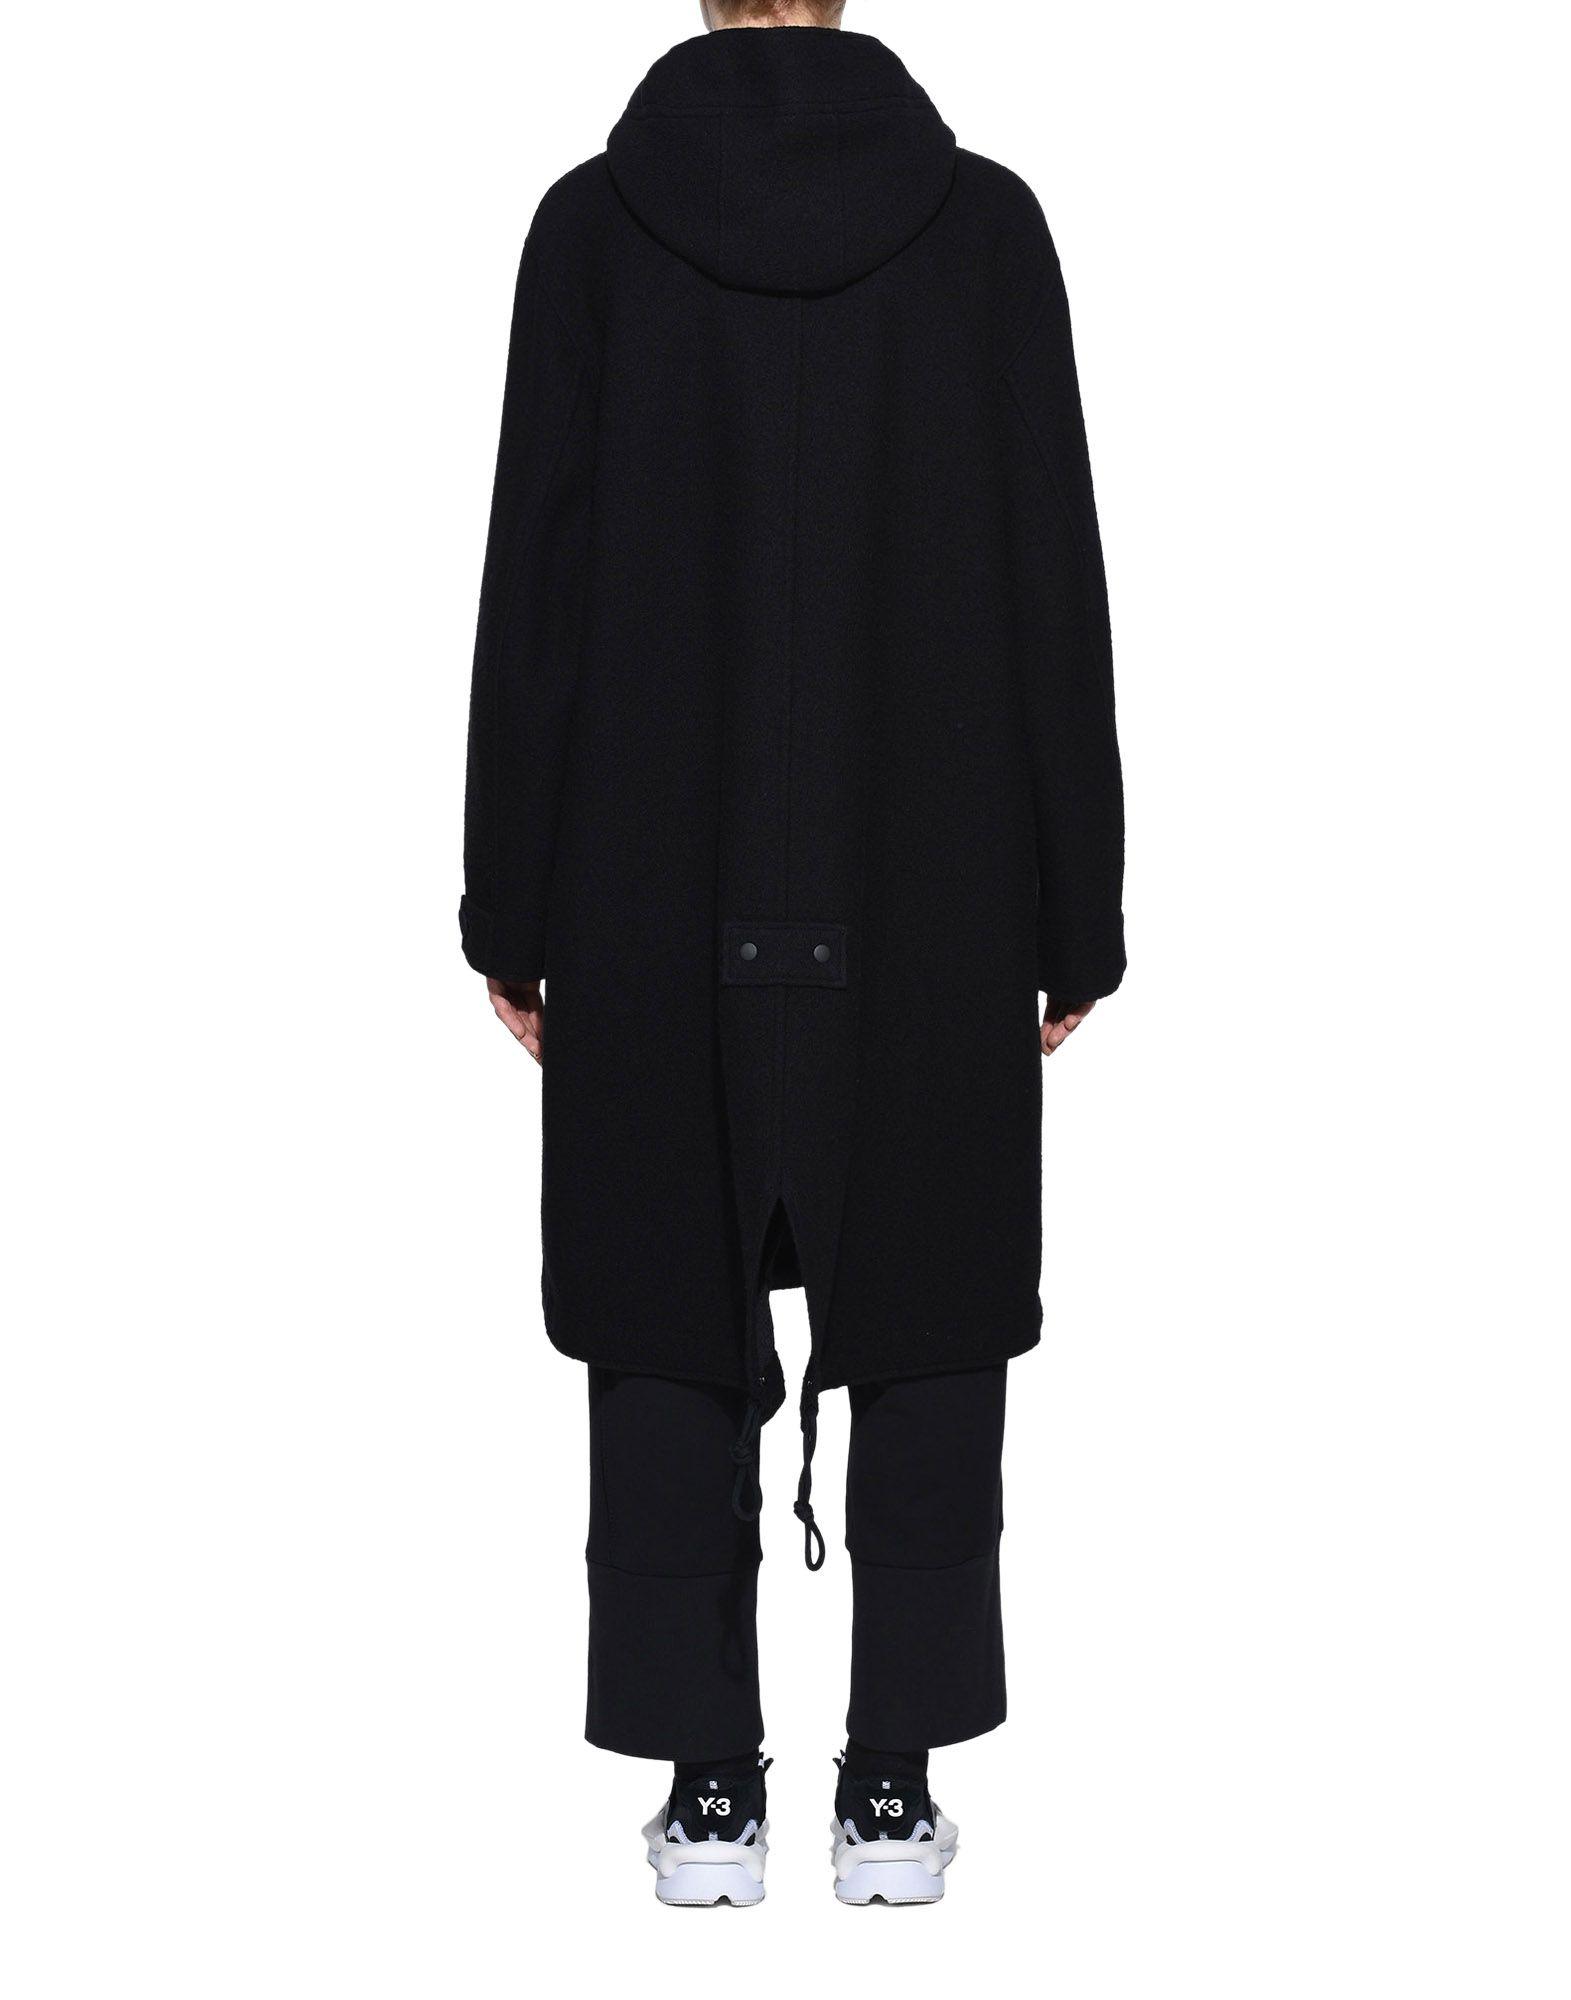 Y-3 Y-3 Reversible Wool Parka Coat Woman d